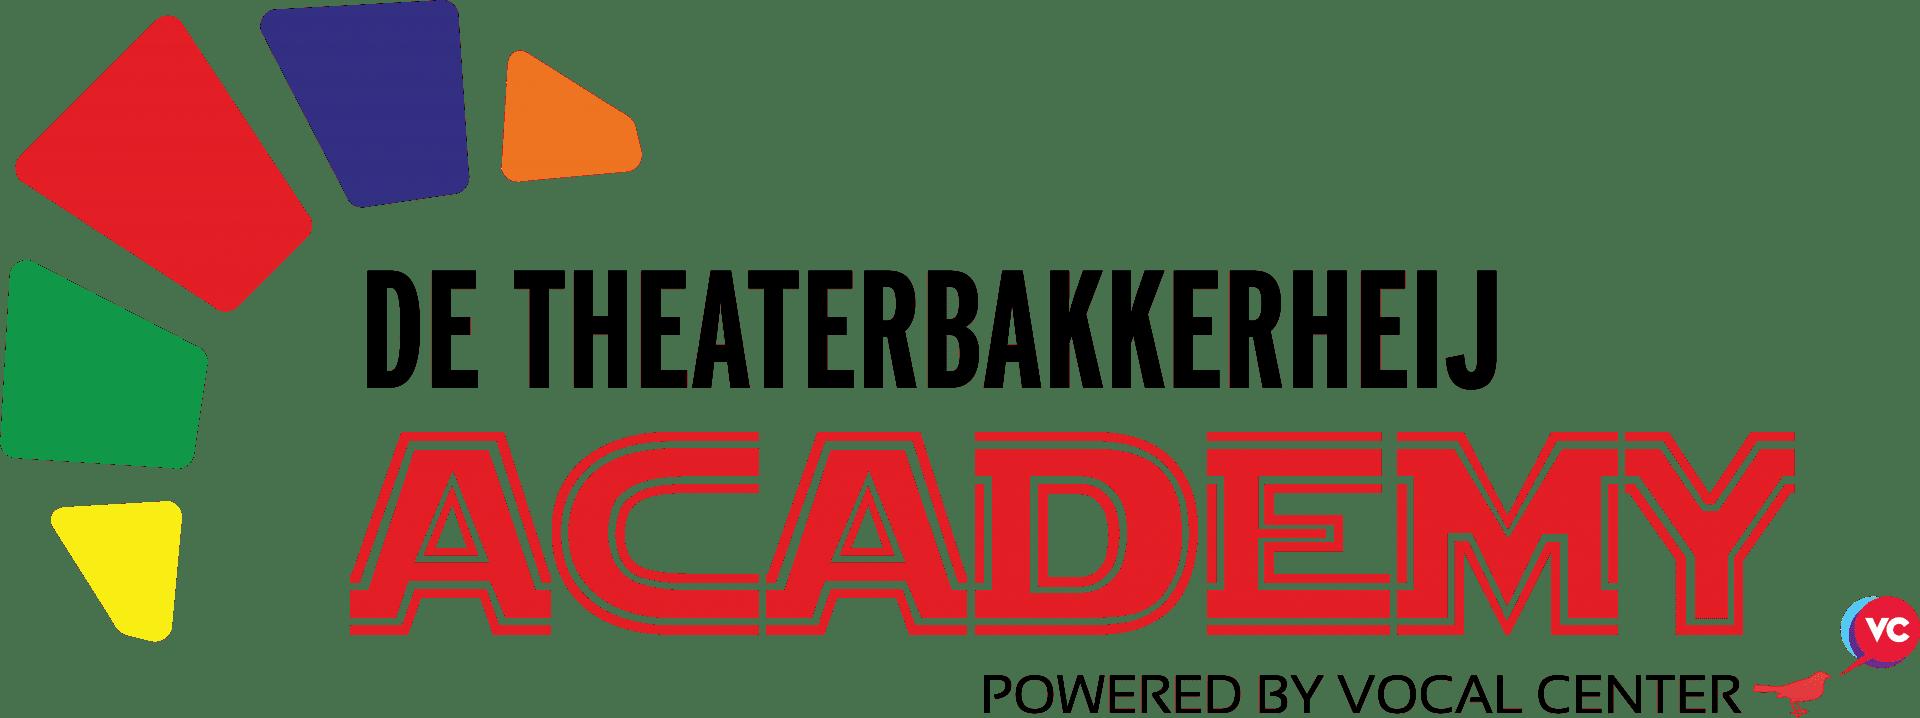 Logo Theaterbakkerheij Academy